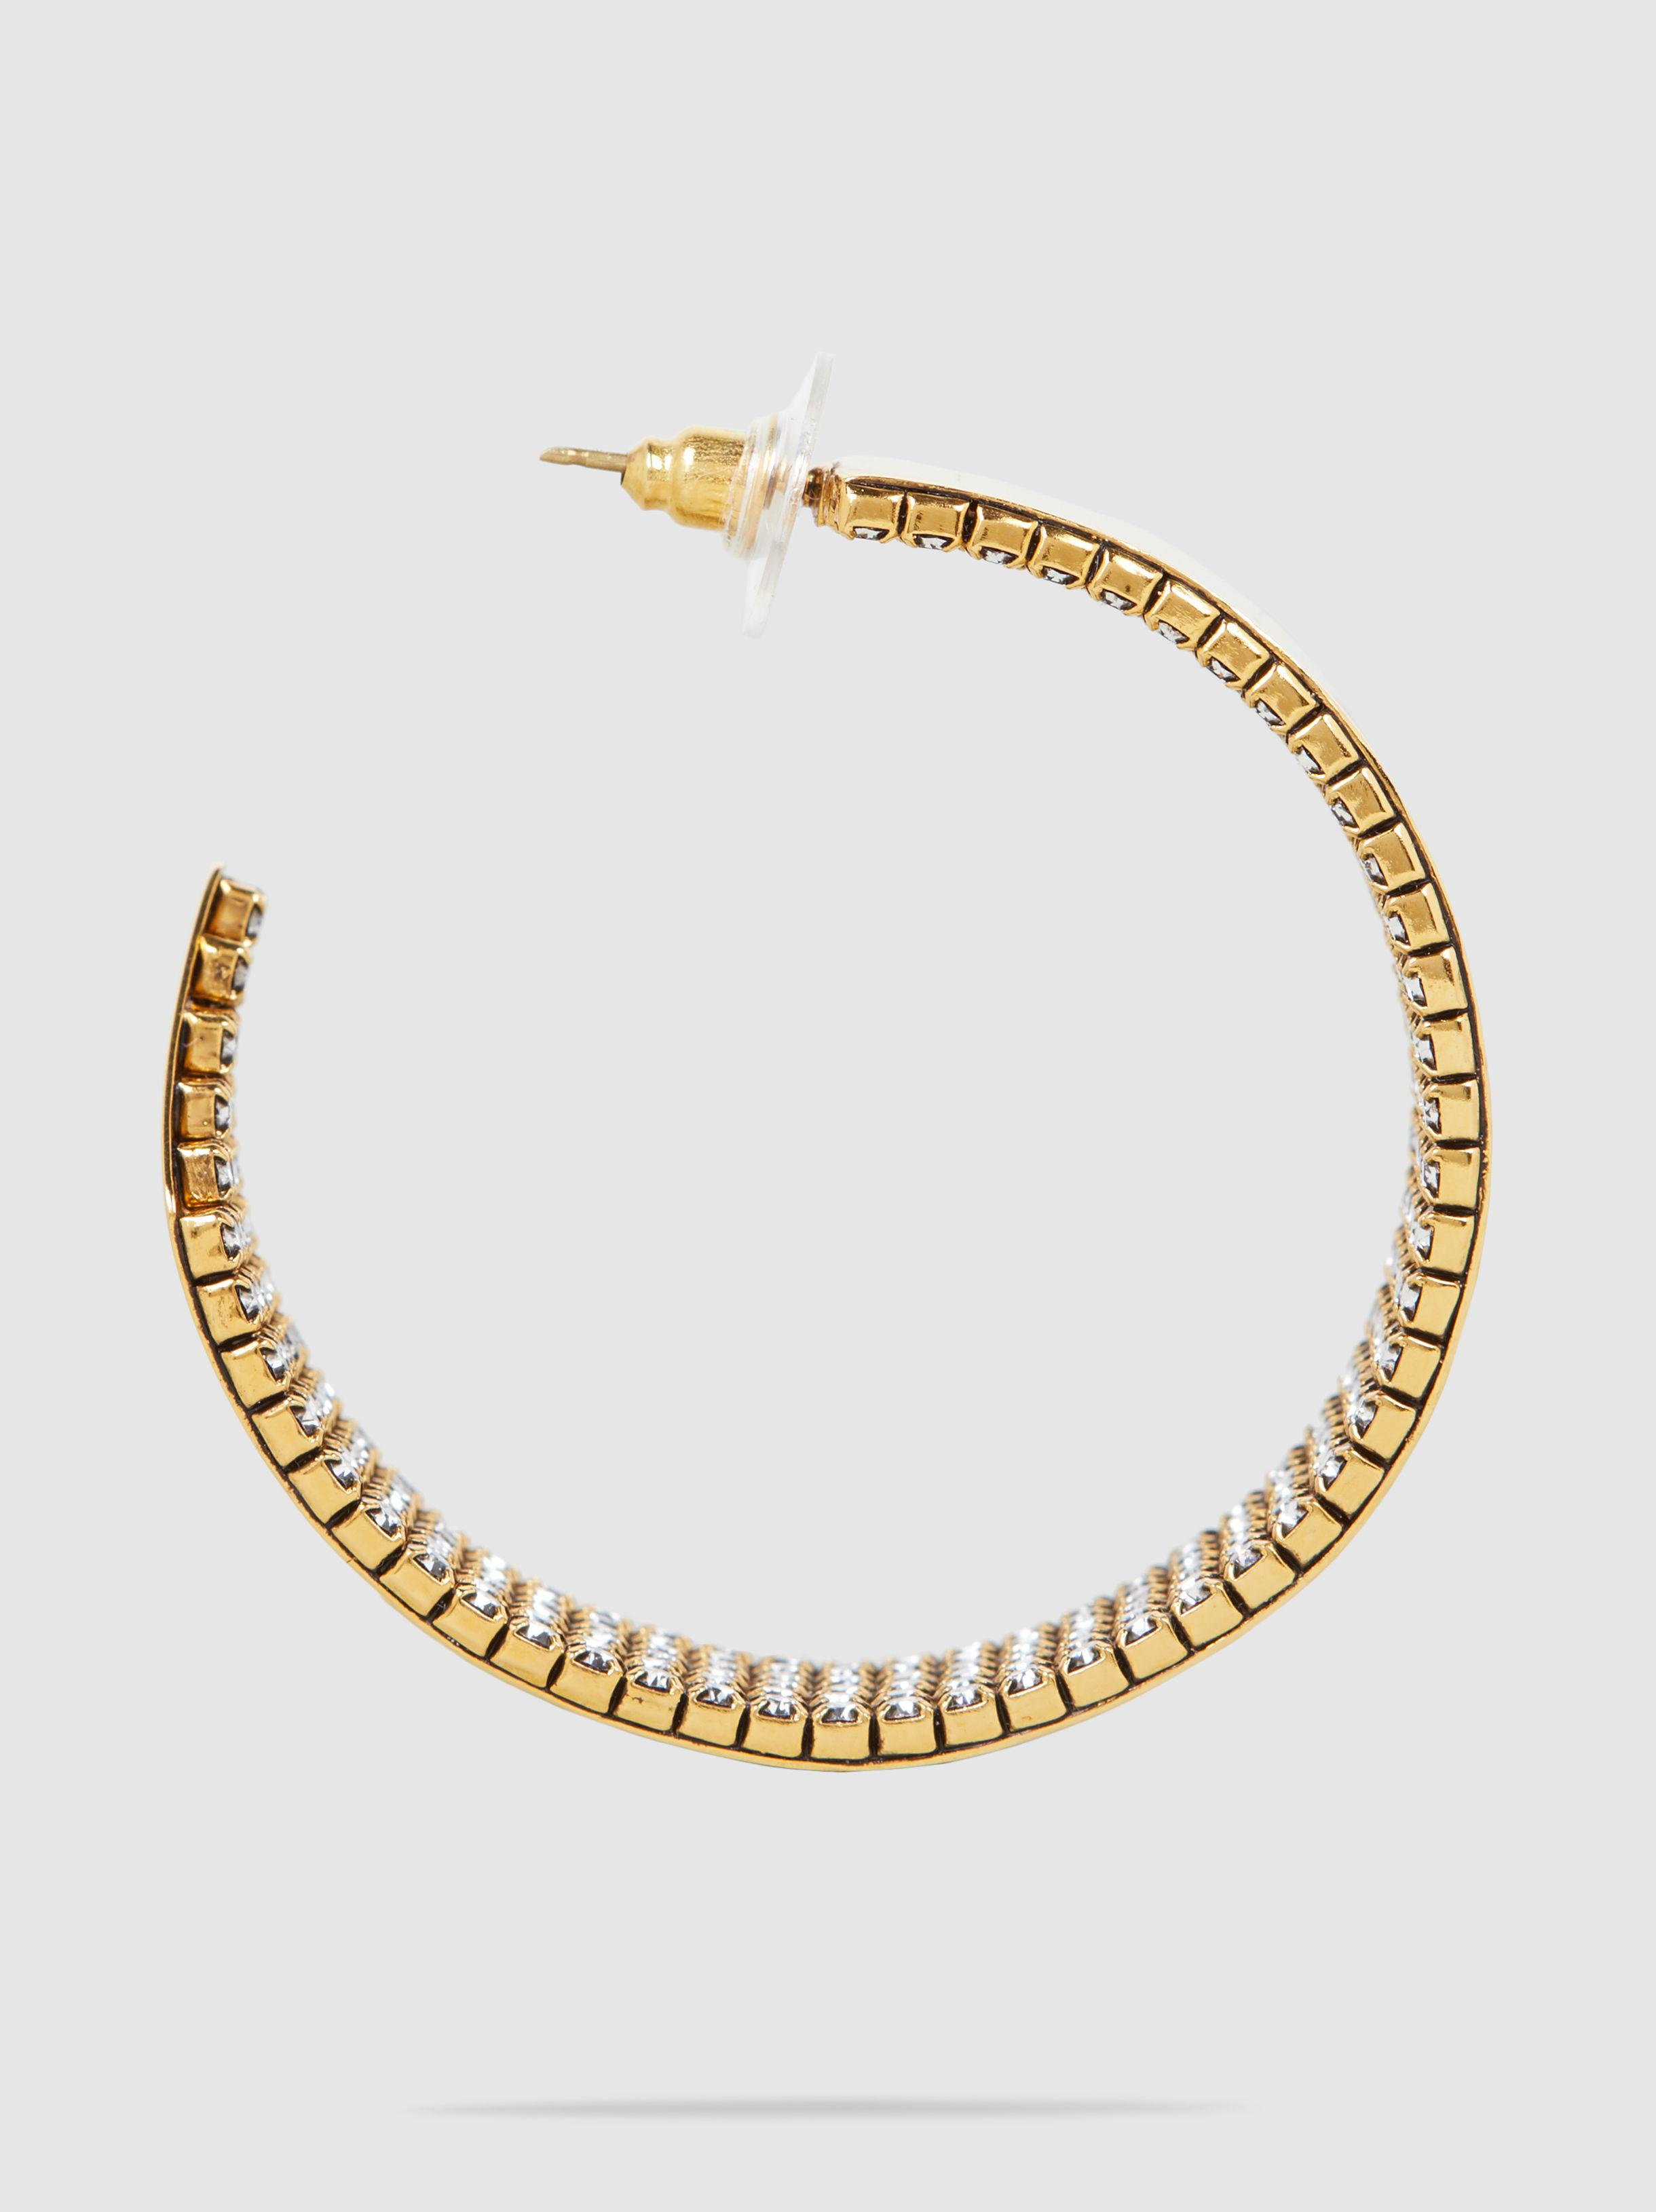 Crystal & Gold-Plated Hoop Earrings Erickson Beamon q3uf1YTQWL